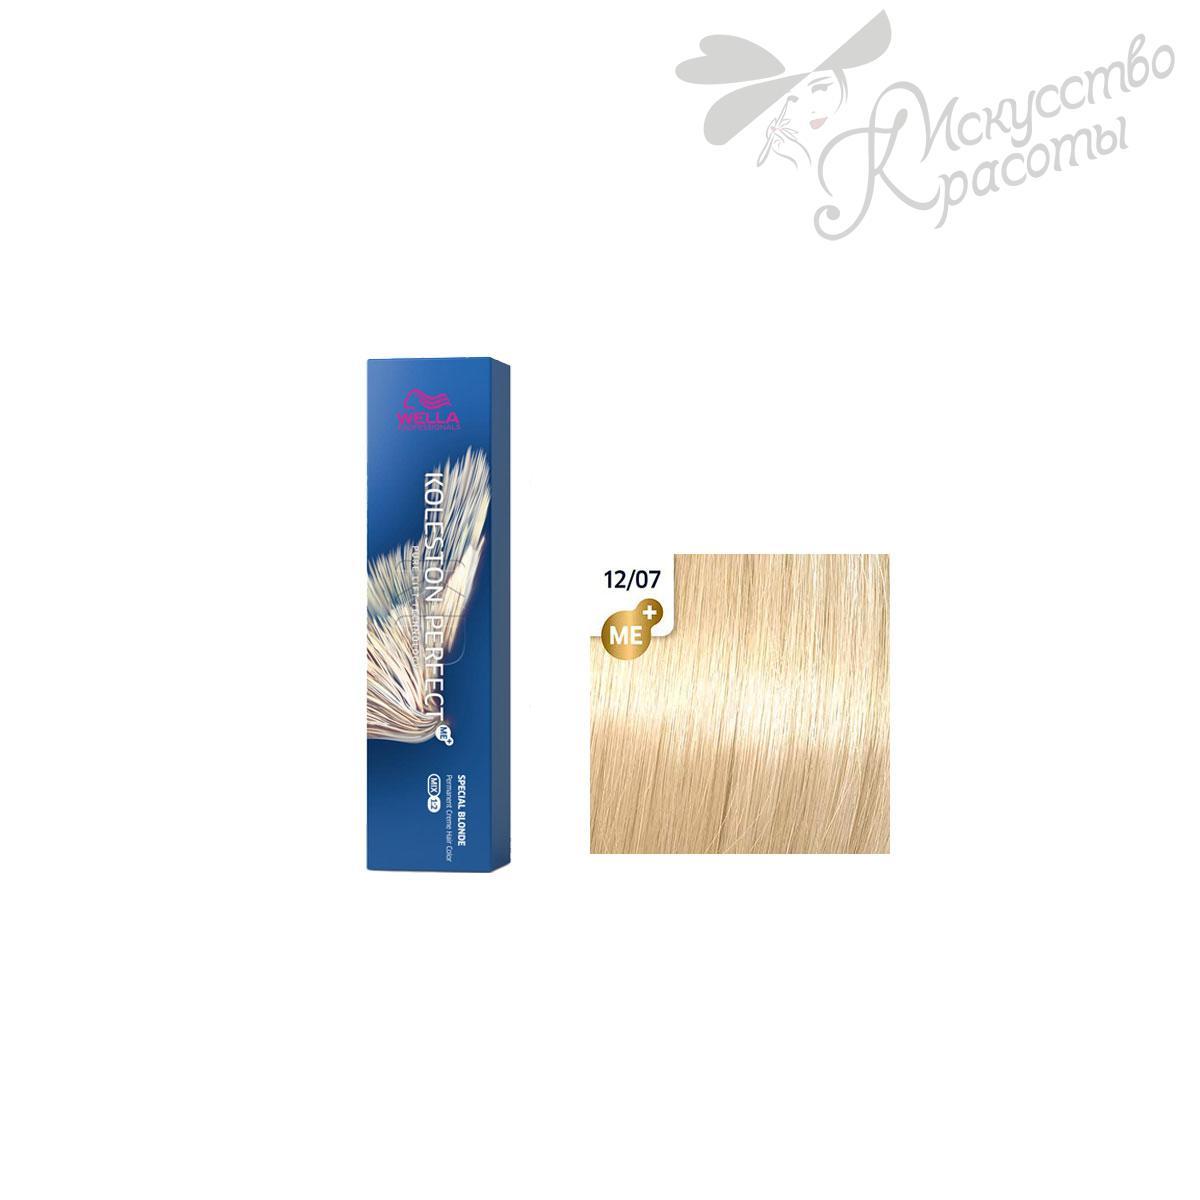 Wella Koleston Special blond 12/07 натурально-коричневый 60 мл